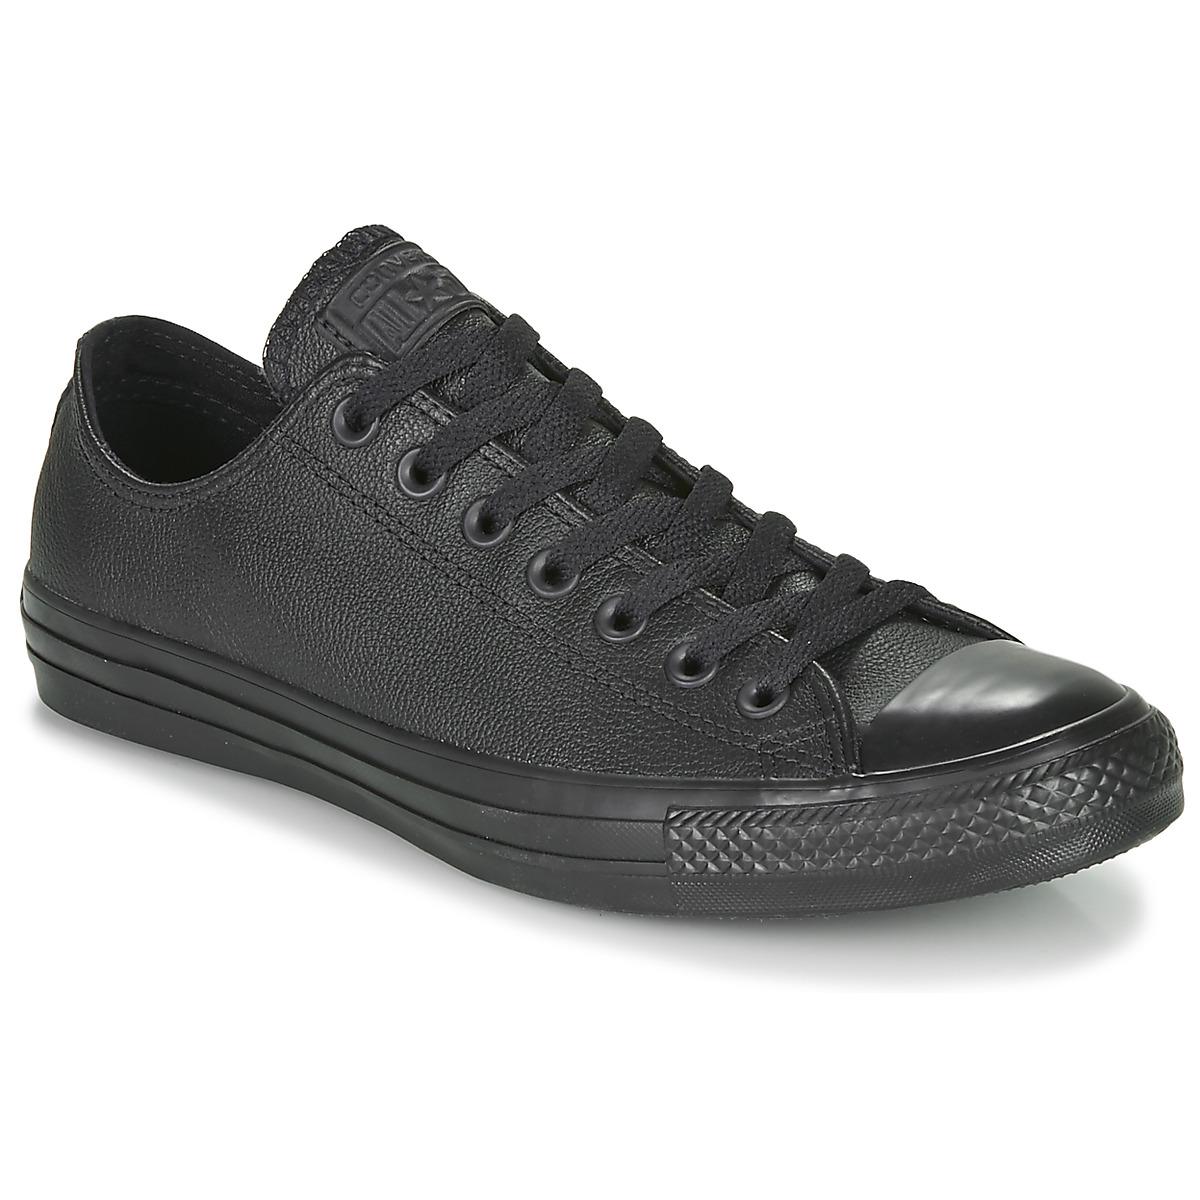 Ugg Pas Cher Sur Shoes Com